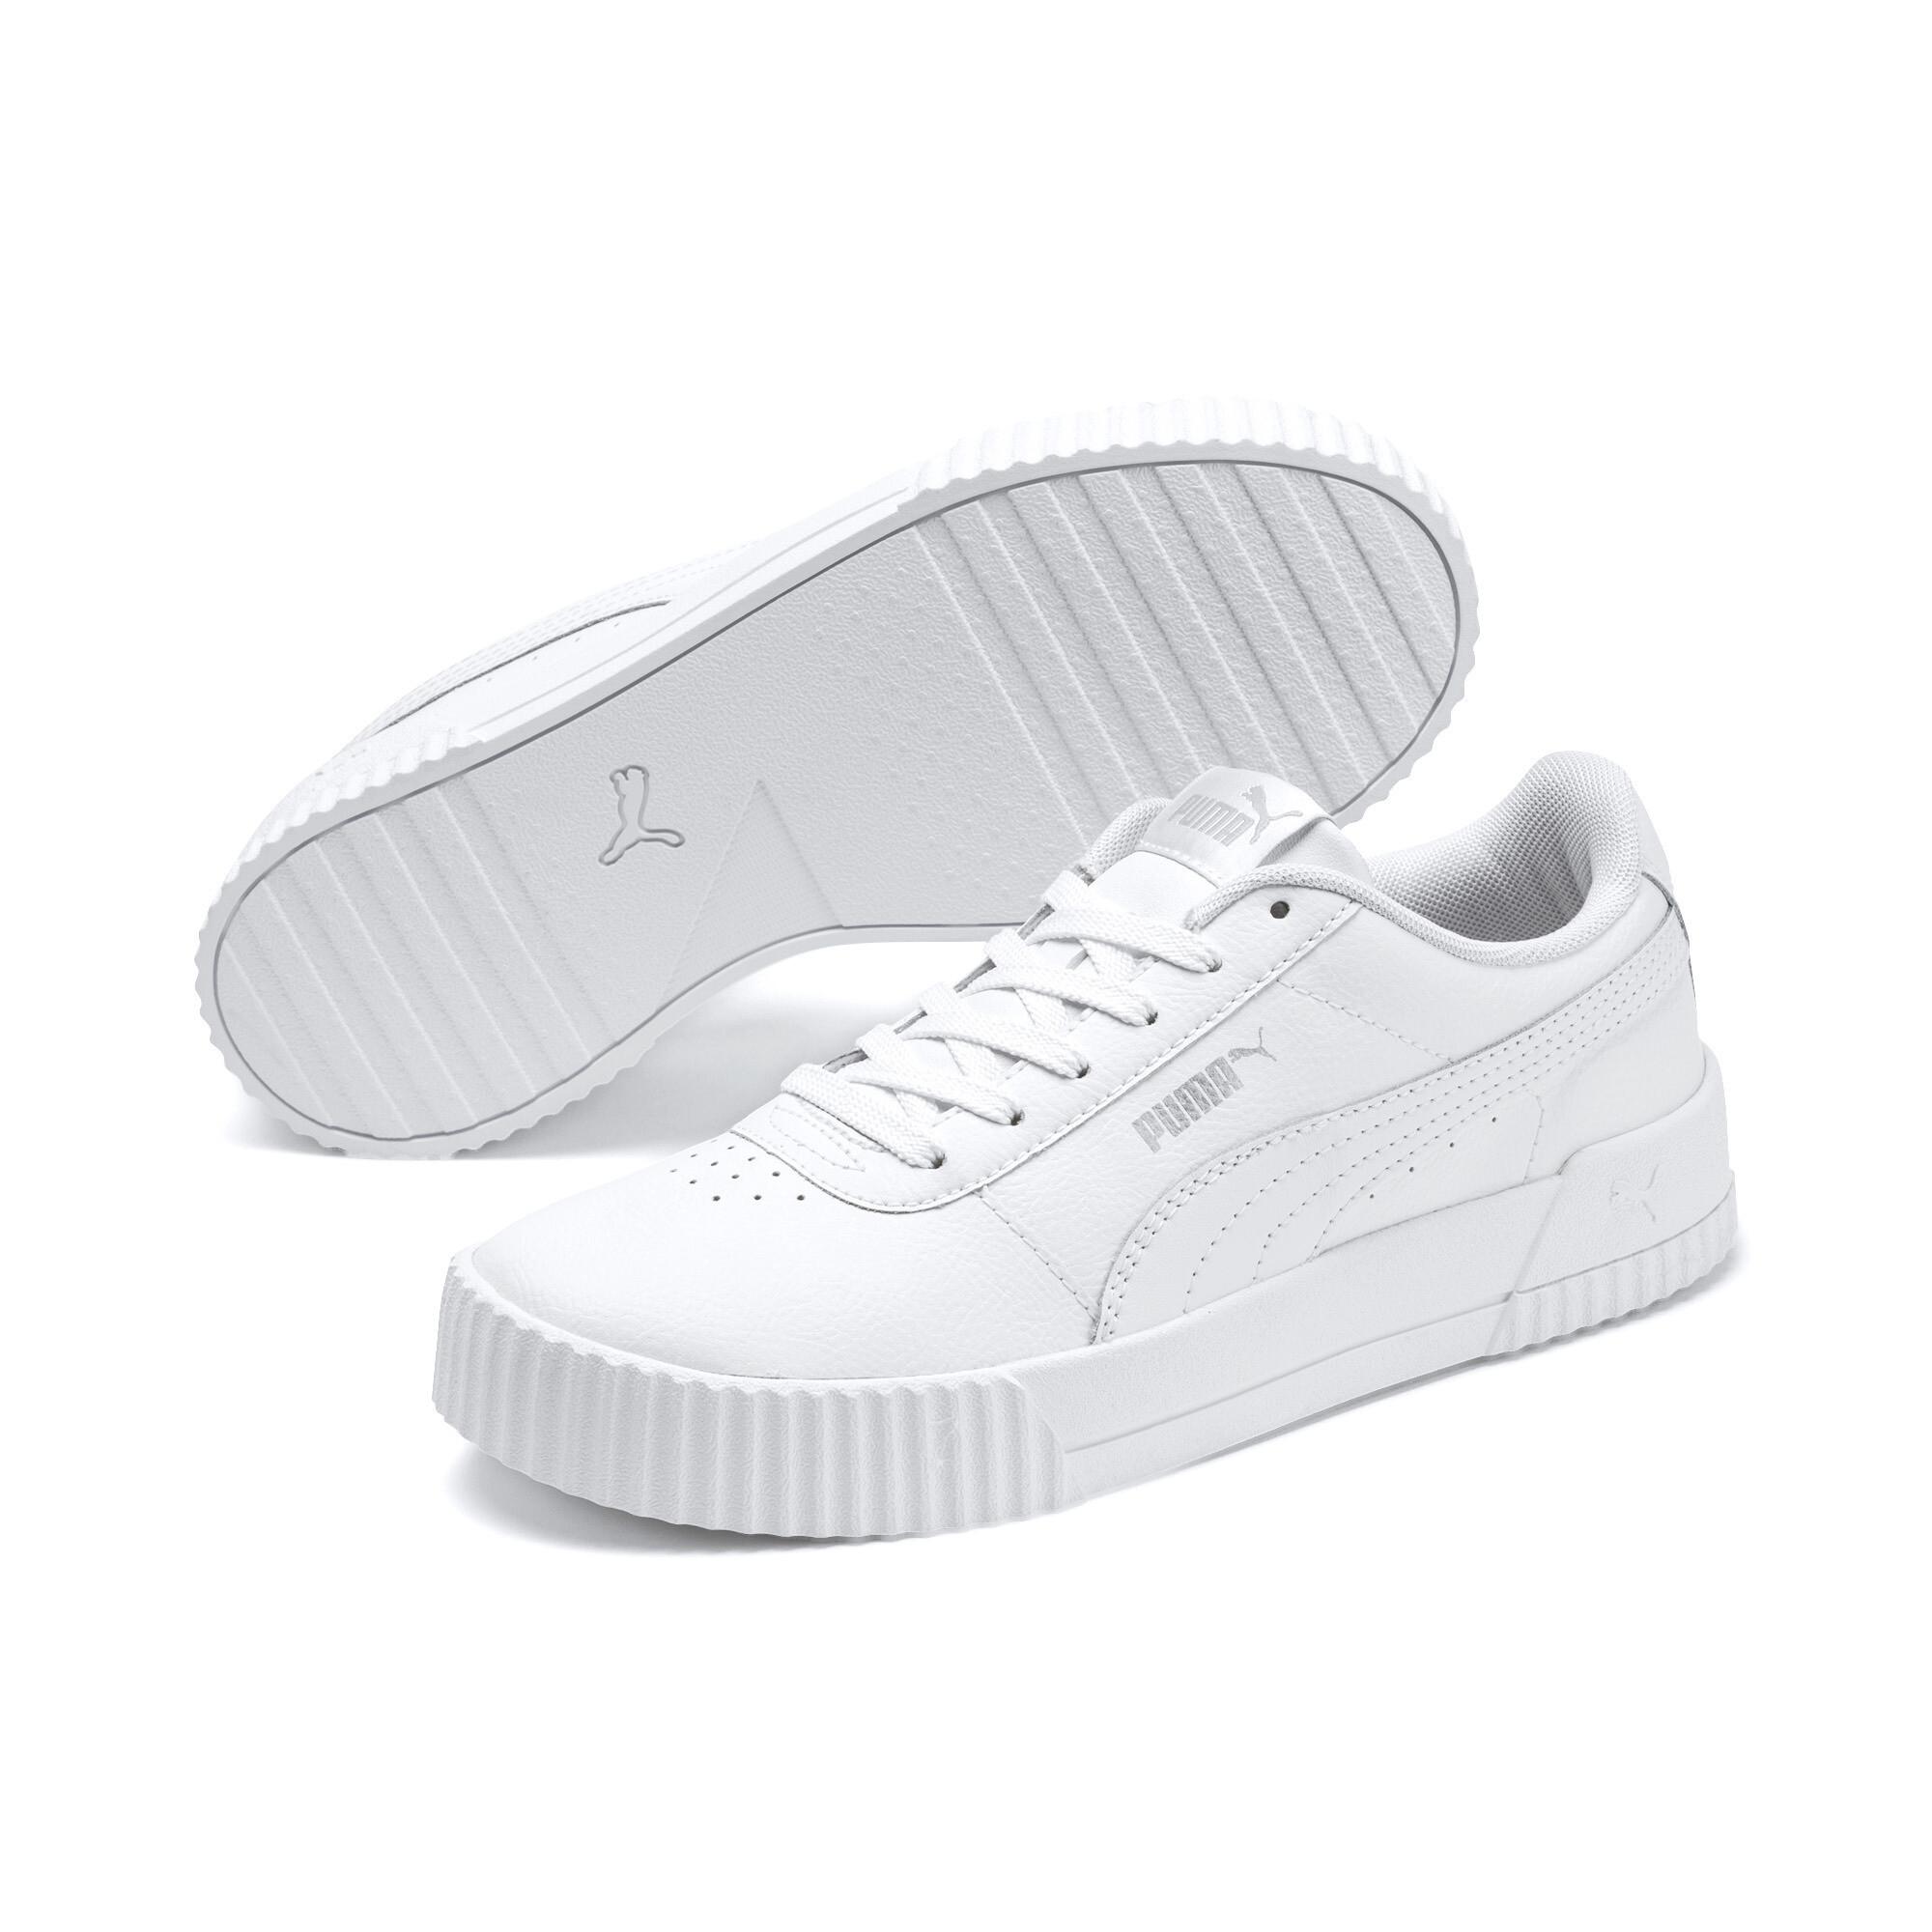 Details zu PUMA Carina Damen Sneaker Frauen Schuhe Basics Neu